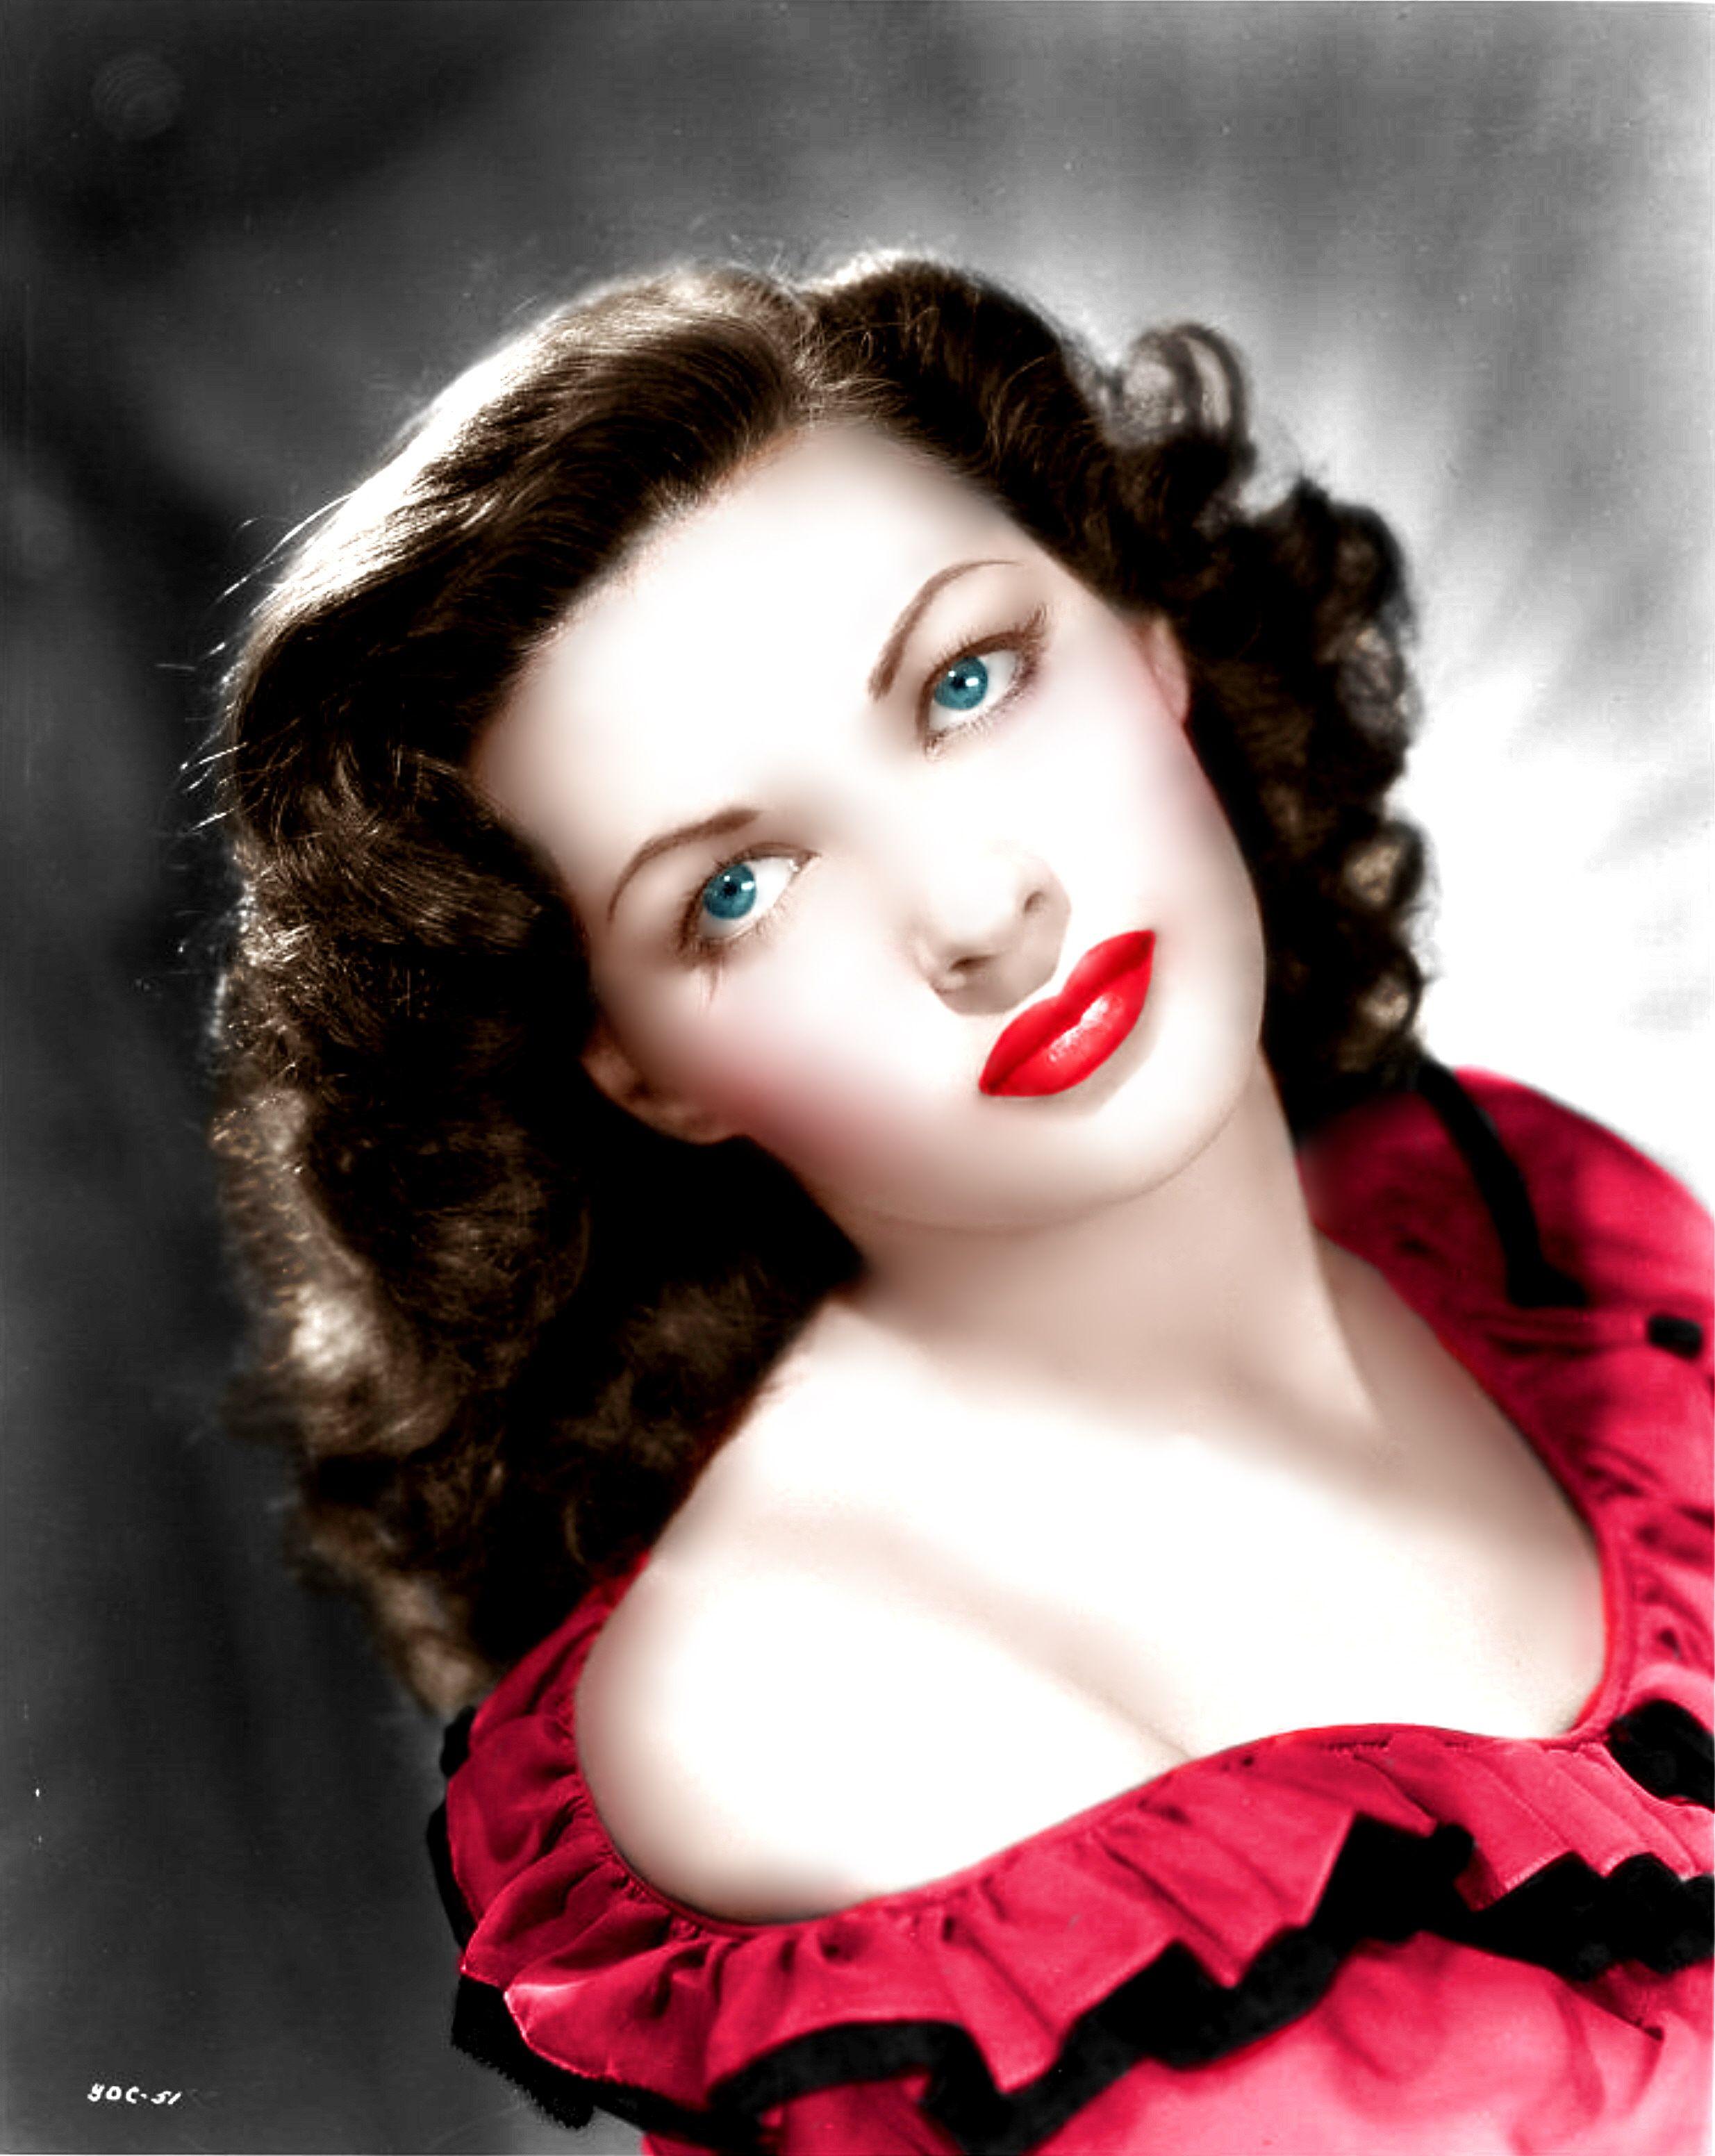 Caroline Williams,Pia Moran (b. ?) Adult pic Mark Burns (1936?007),Mary Astor